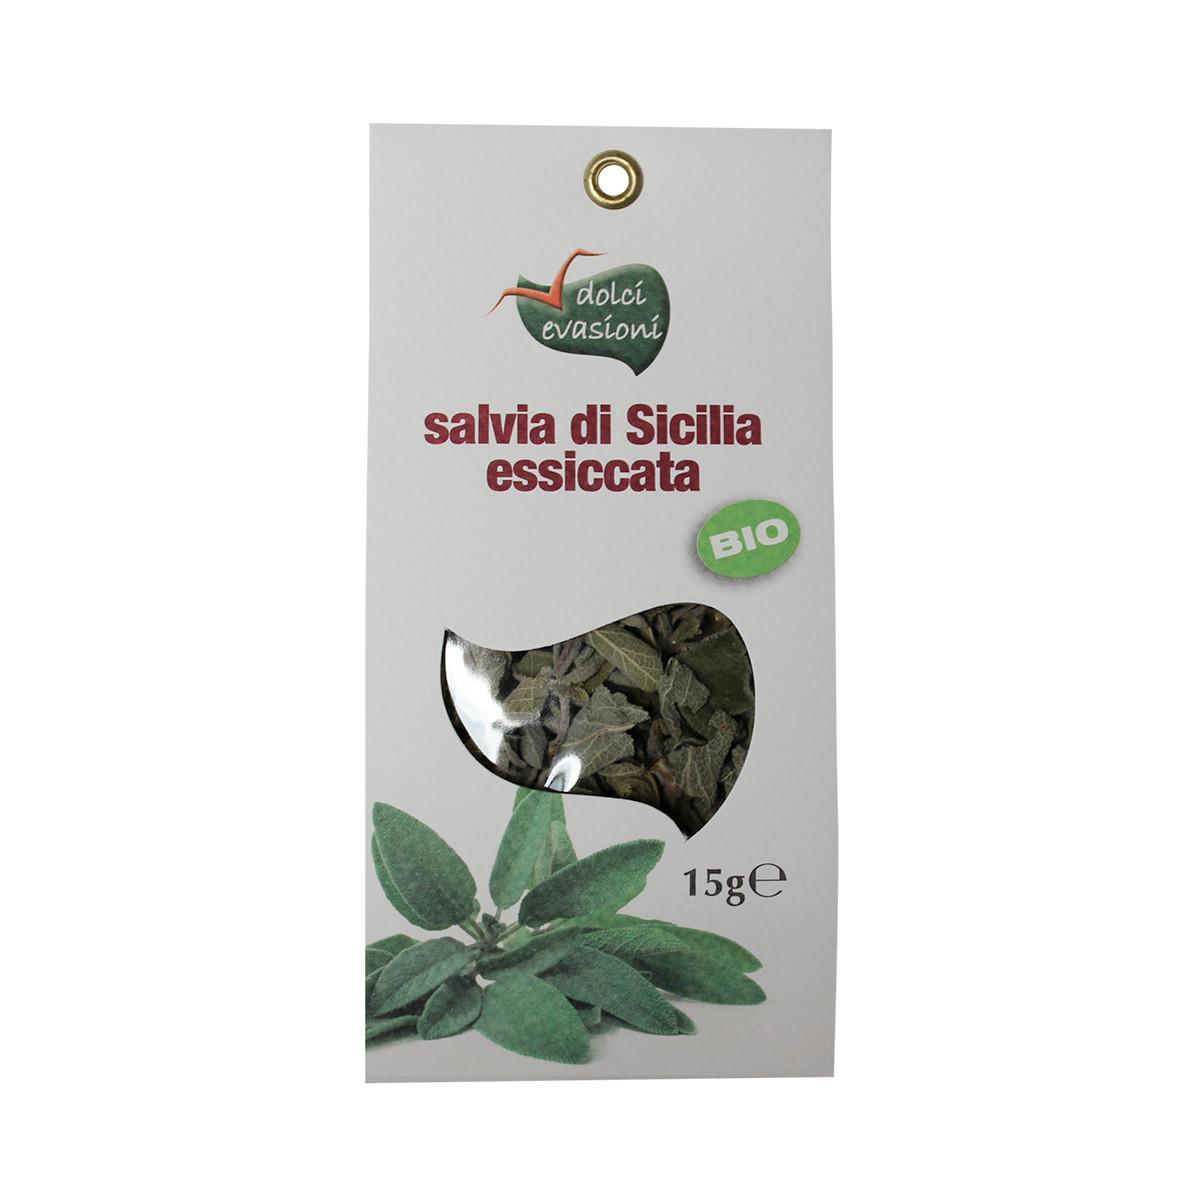 salvia essiccata siciliana